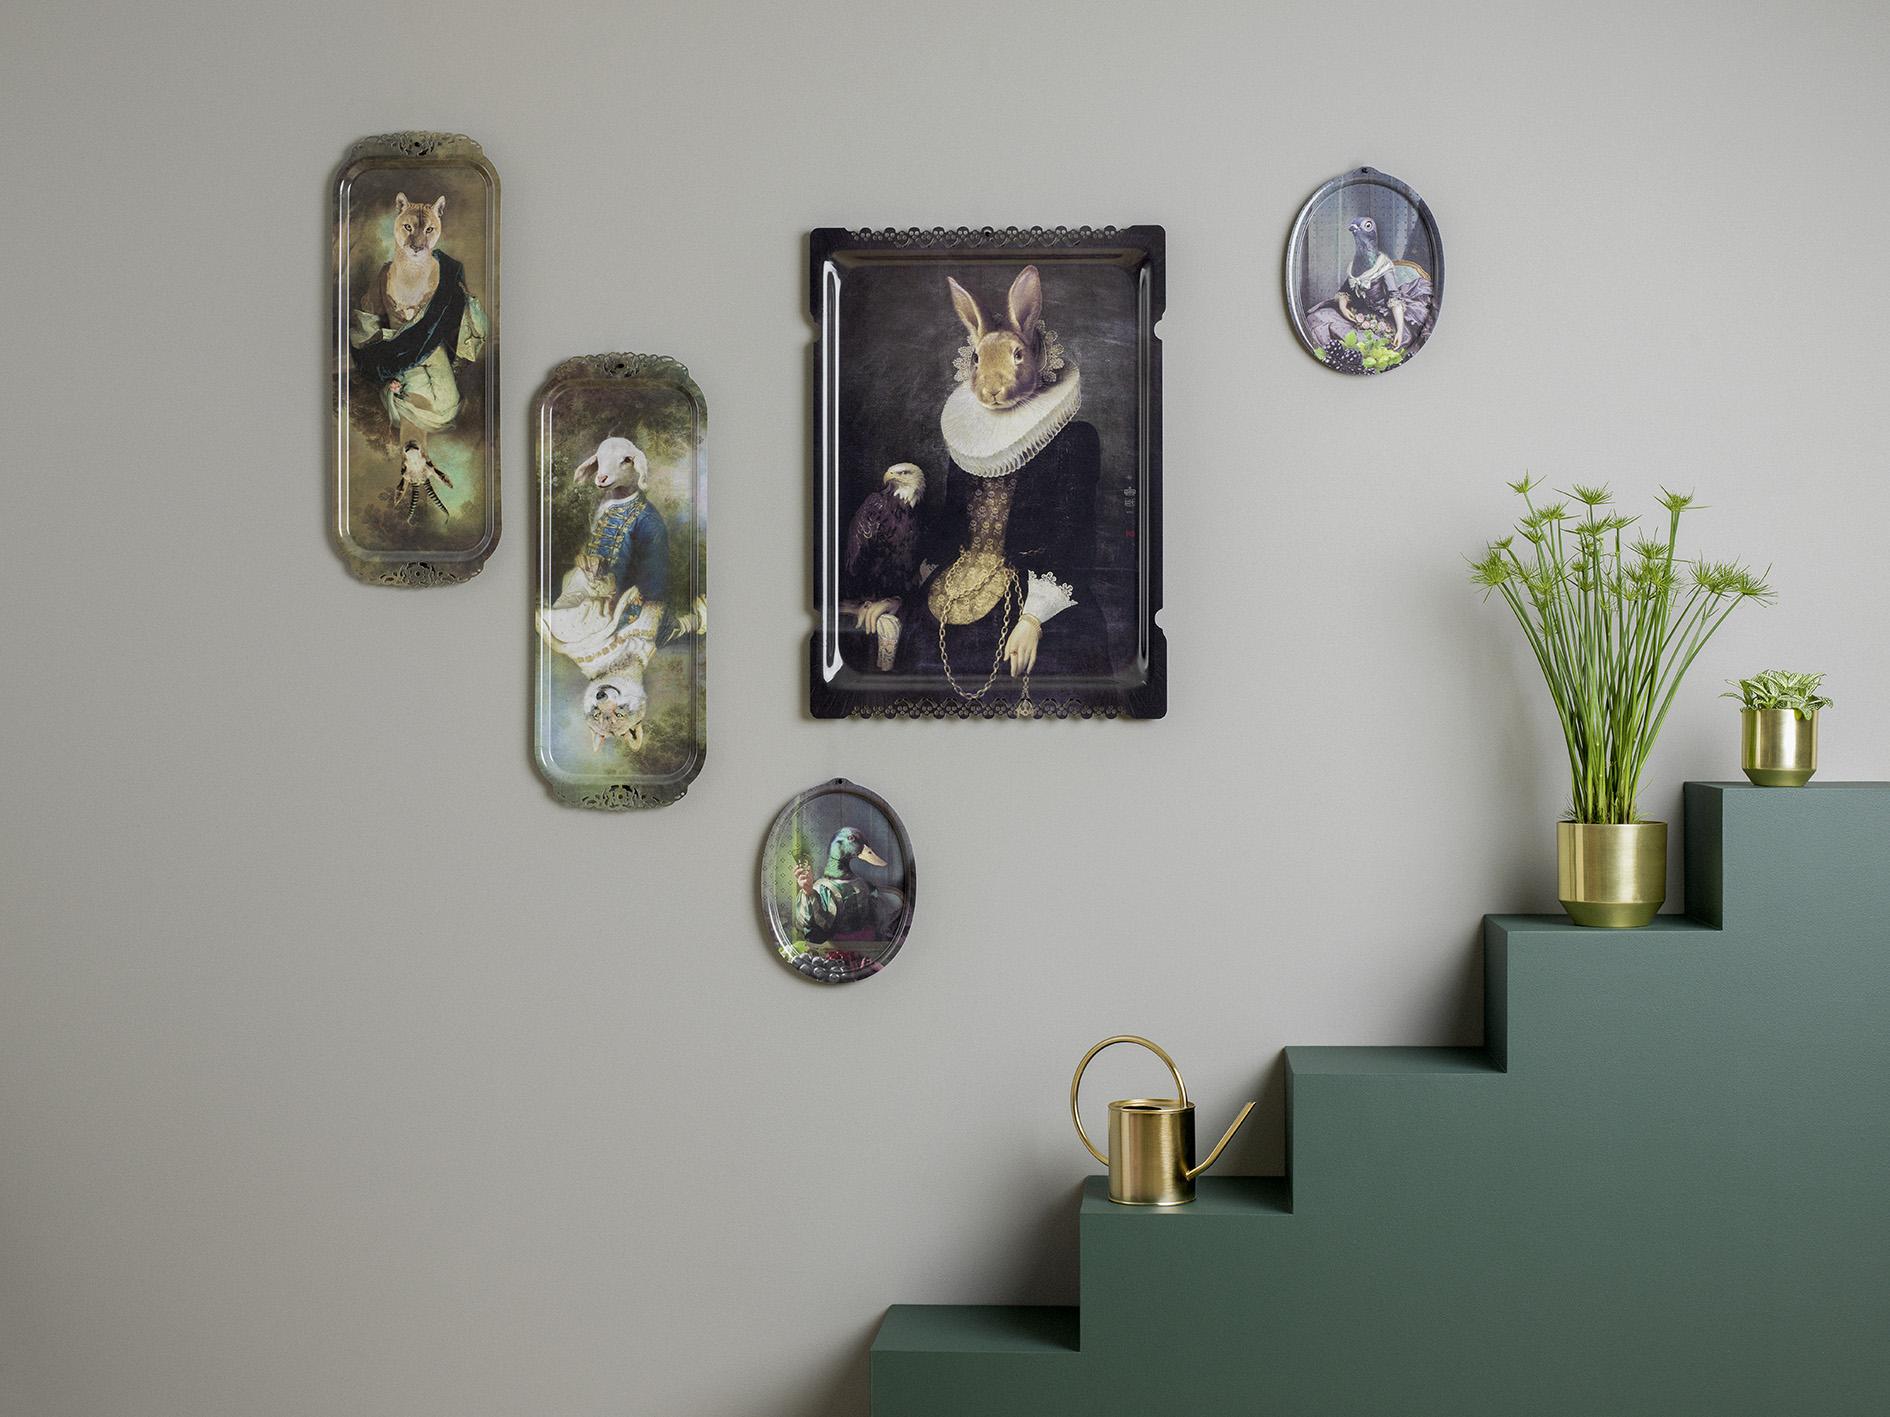 Ibride Galerie De Portraits Large Rectangular Tray - Zhao 2.jpg